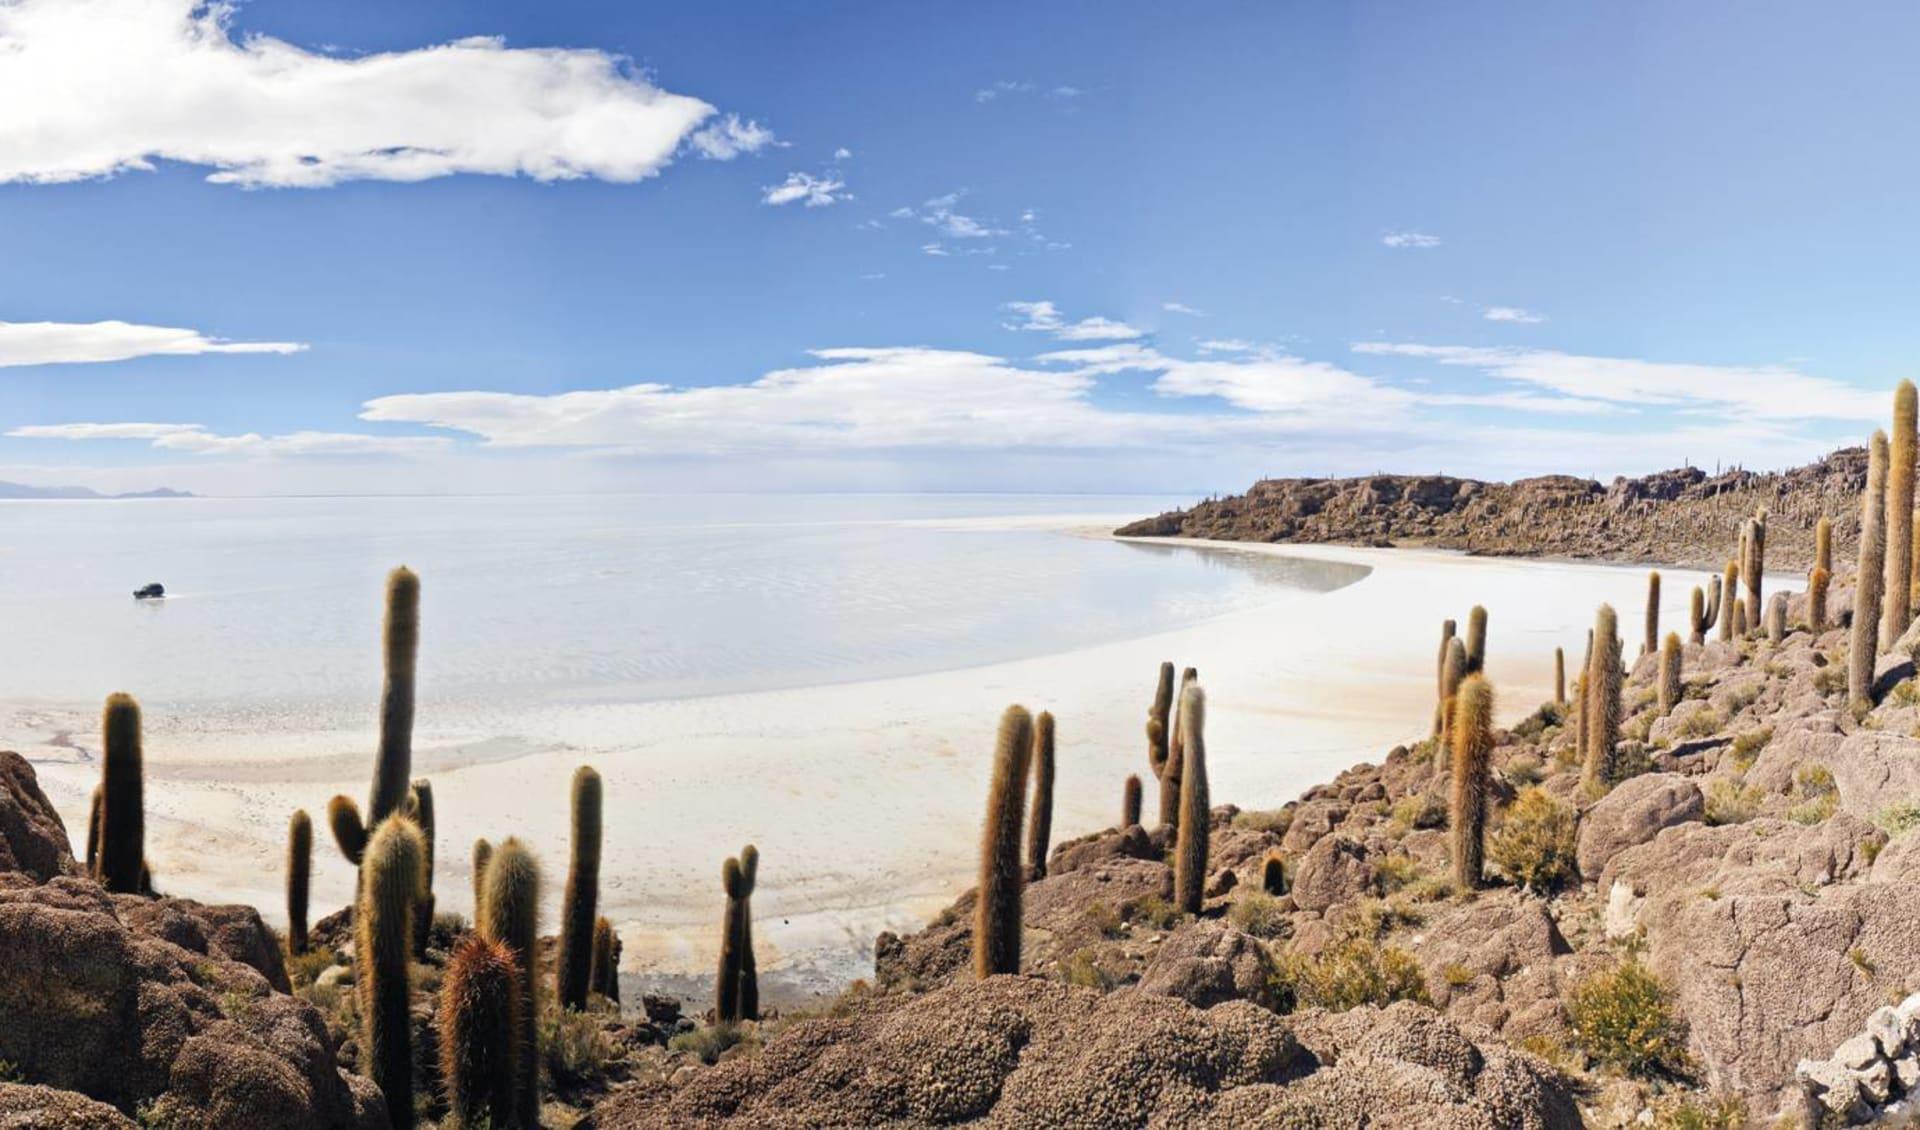 Gruppenreise Imperio Inca ab Lima: Bolivien - Salar de Uyuni - Insel mit Kakteen